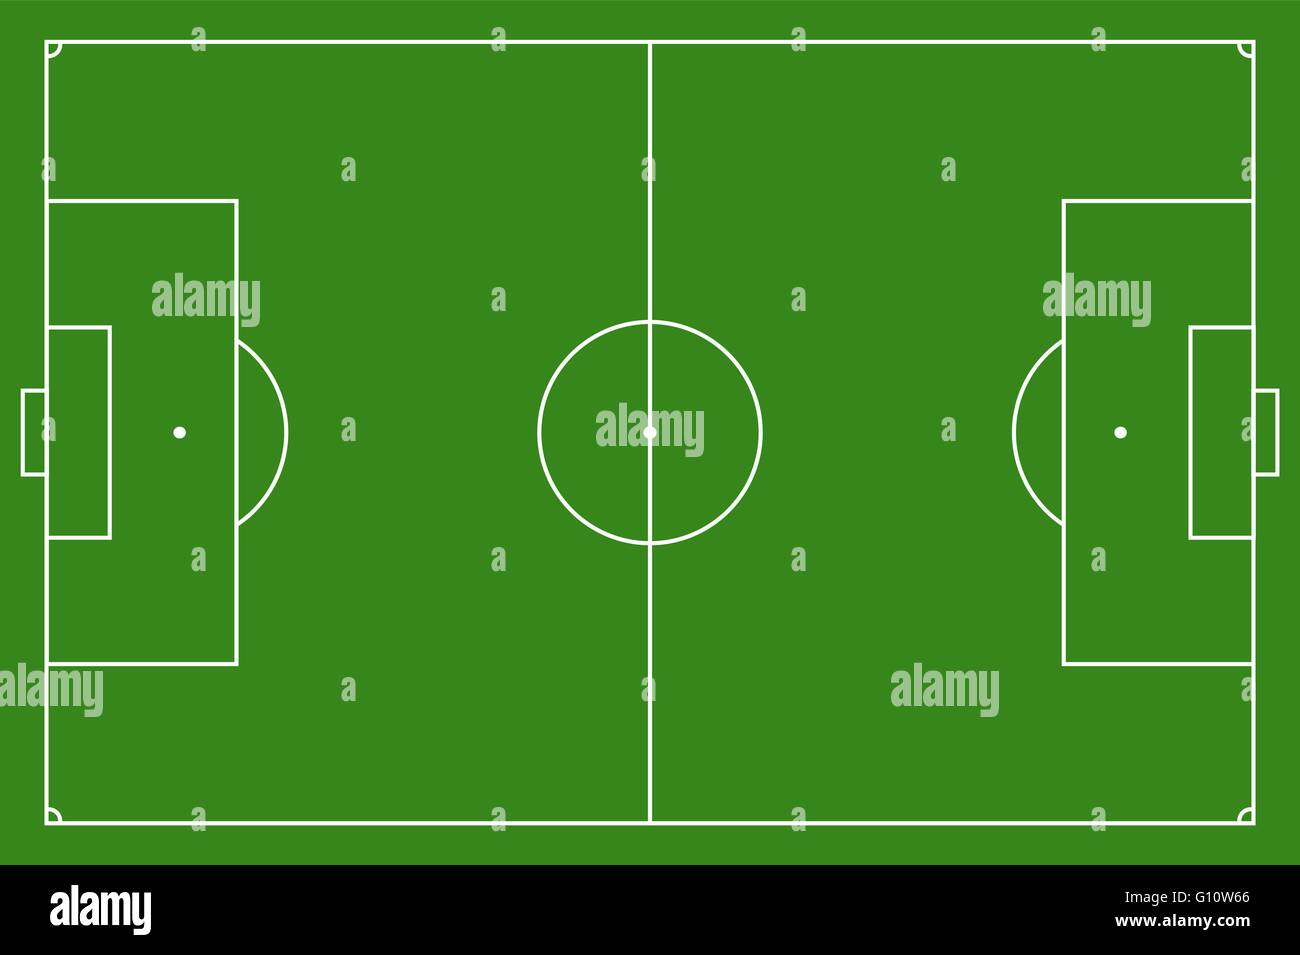 Soccer Field Vector Illustration Football Field With